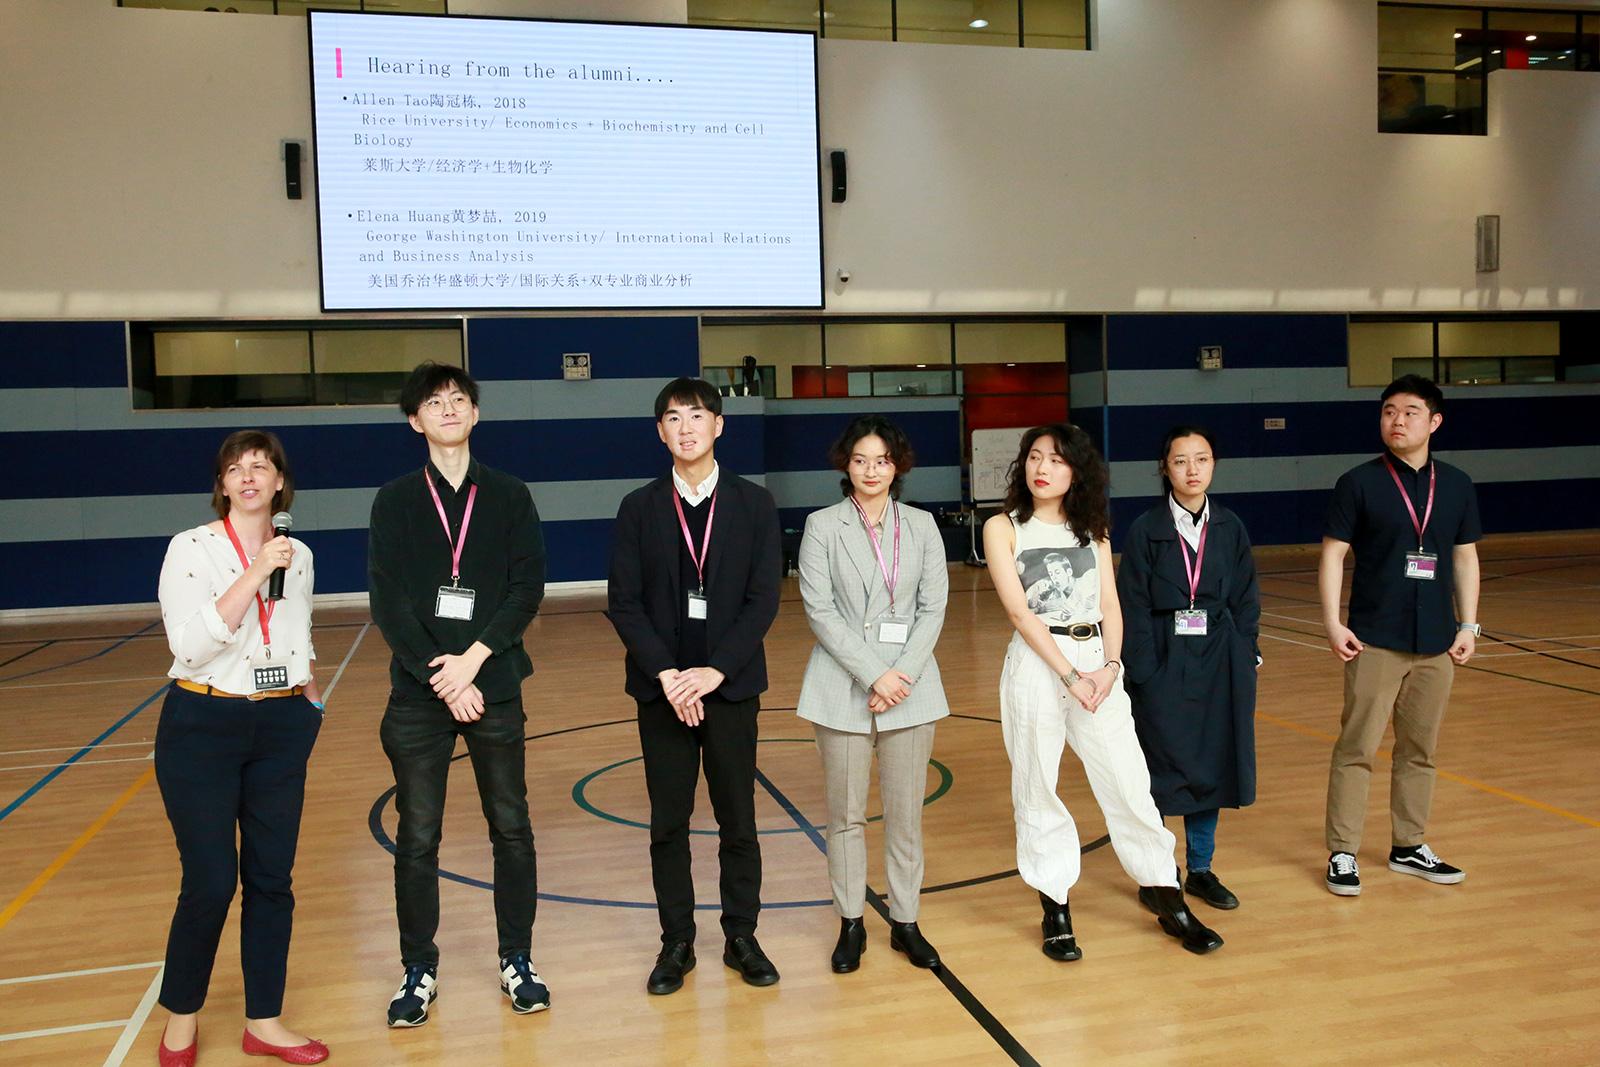 alumni-panel-02